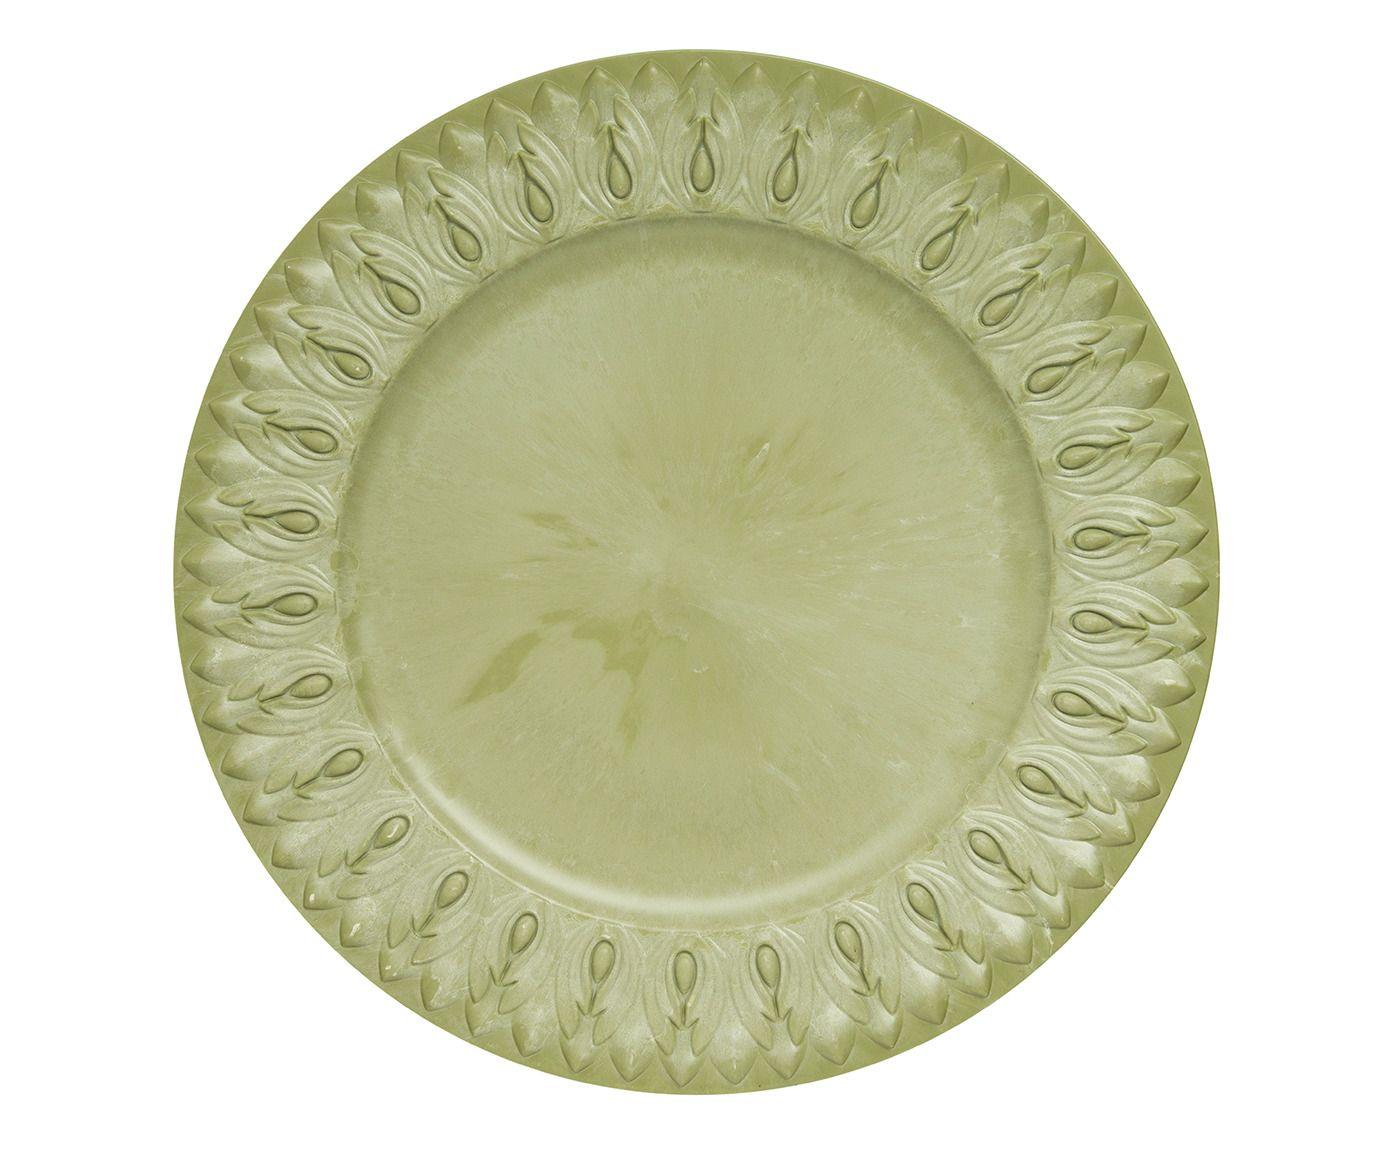 Sousplat Greco Jônico Verde Wasabi - 36cm | Westwing.com.br